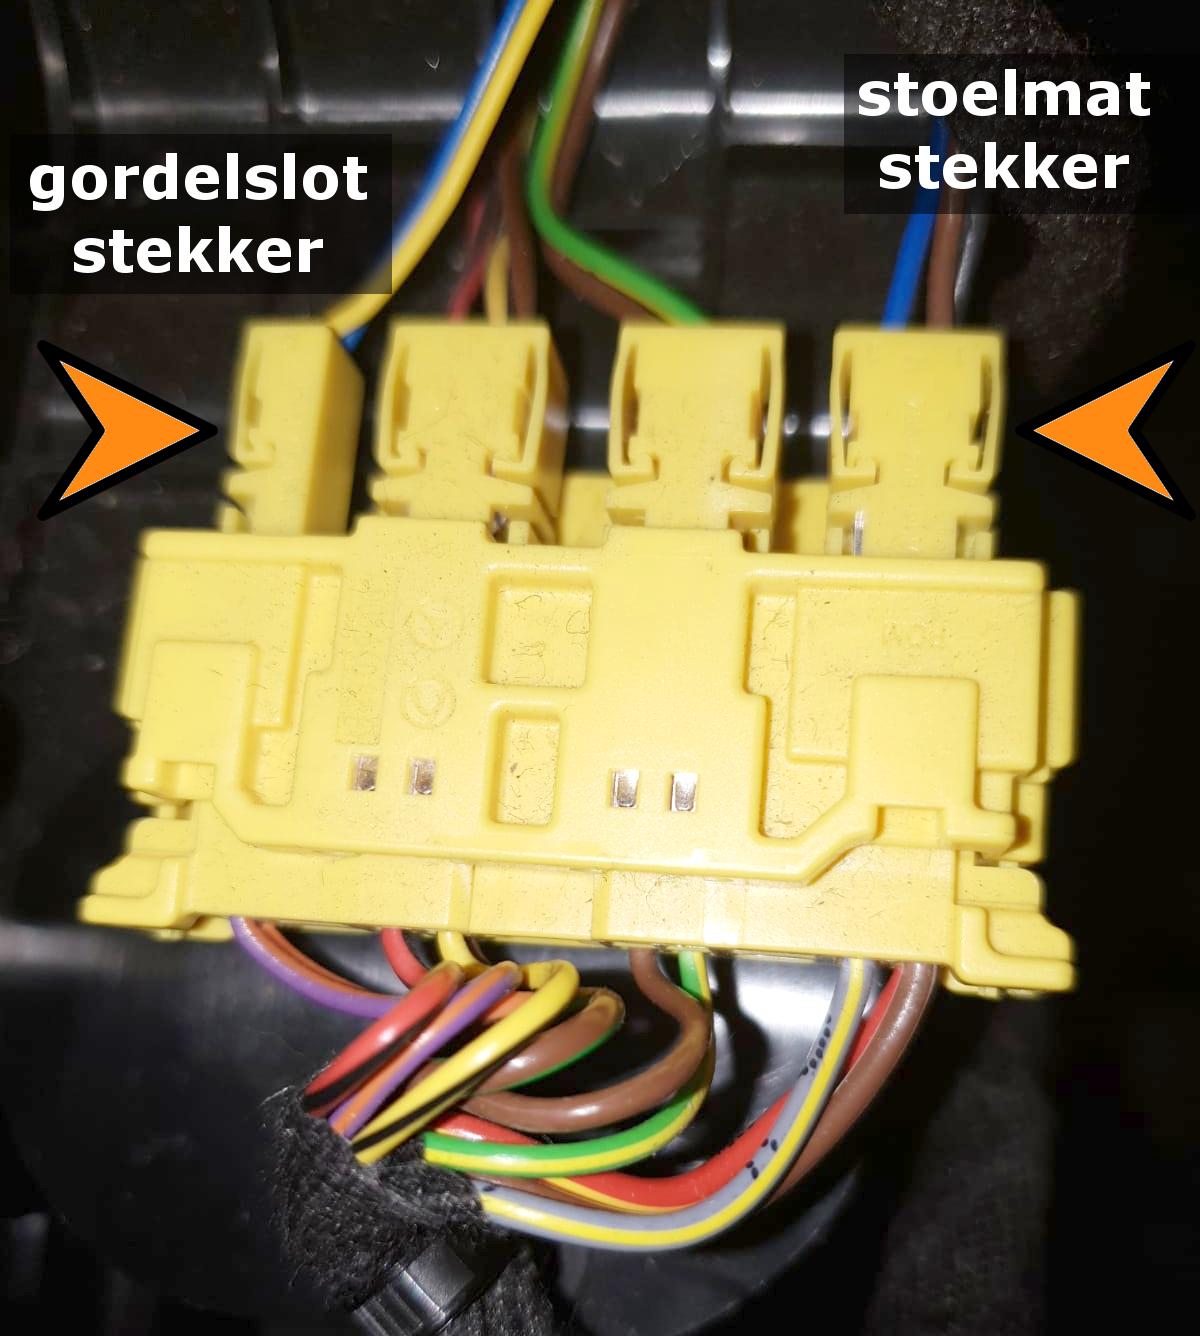 Mercedes B W246 2011+ Diagnostische Passagiersstoel Mat Sensor / Emulator - met pinnen